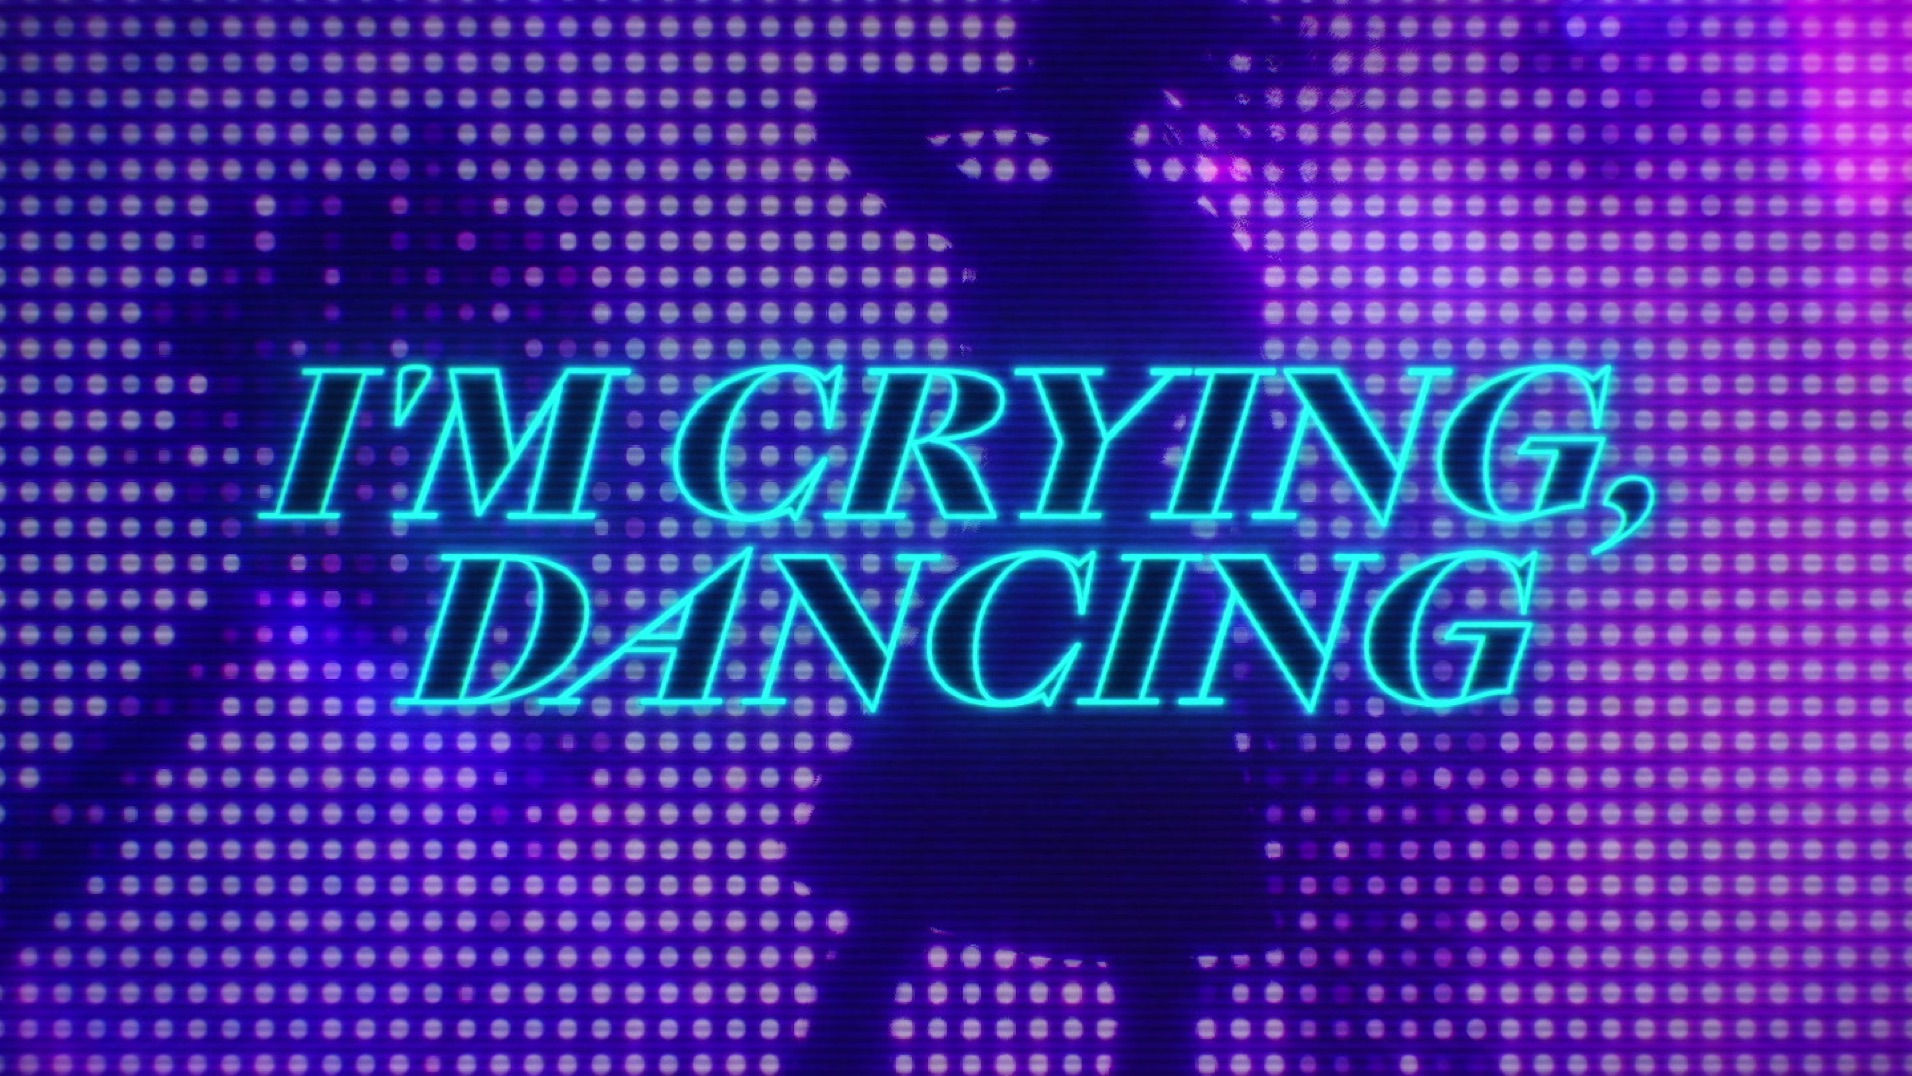 Cry Dancing Lyric Video By Notd Nina Nesbitt On Apple Music 1 user explained ain't nobody meaning. apple music